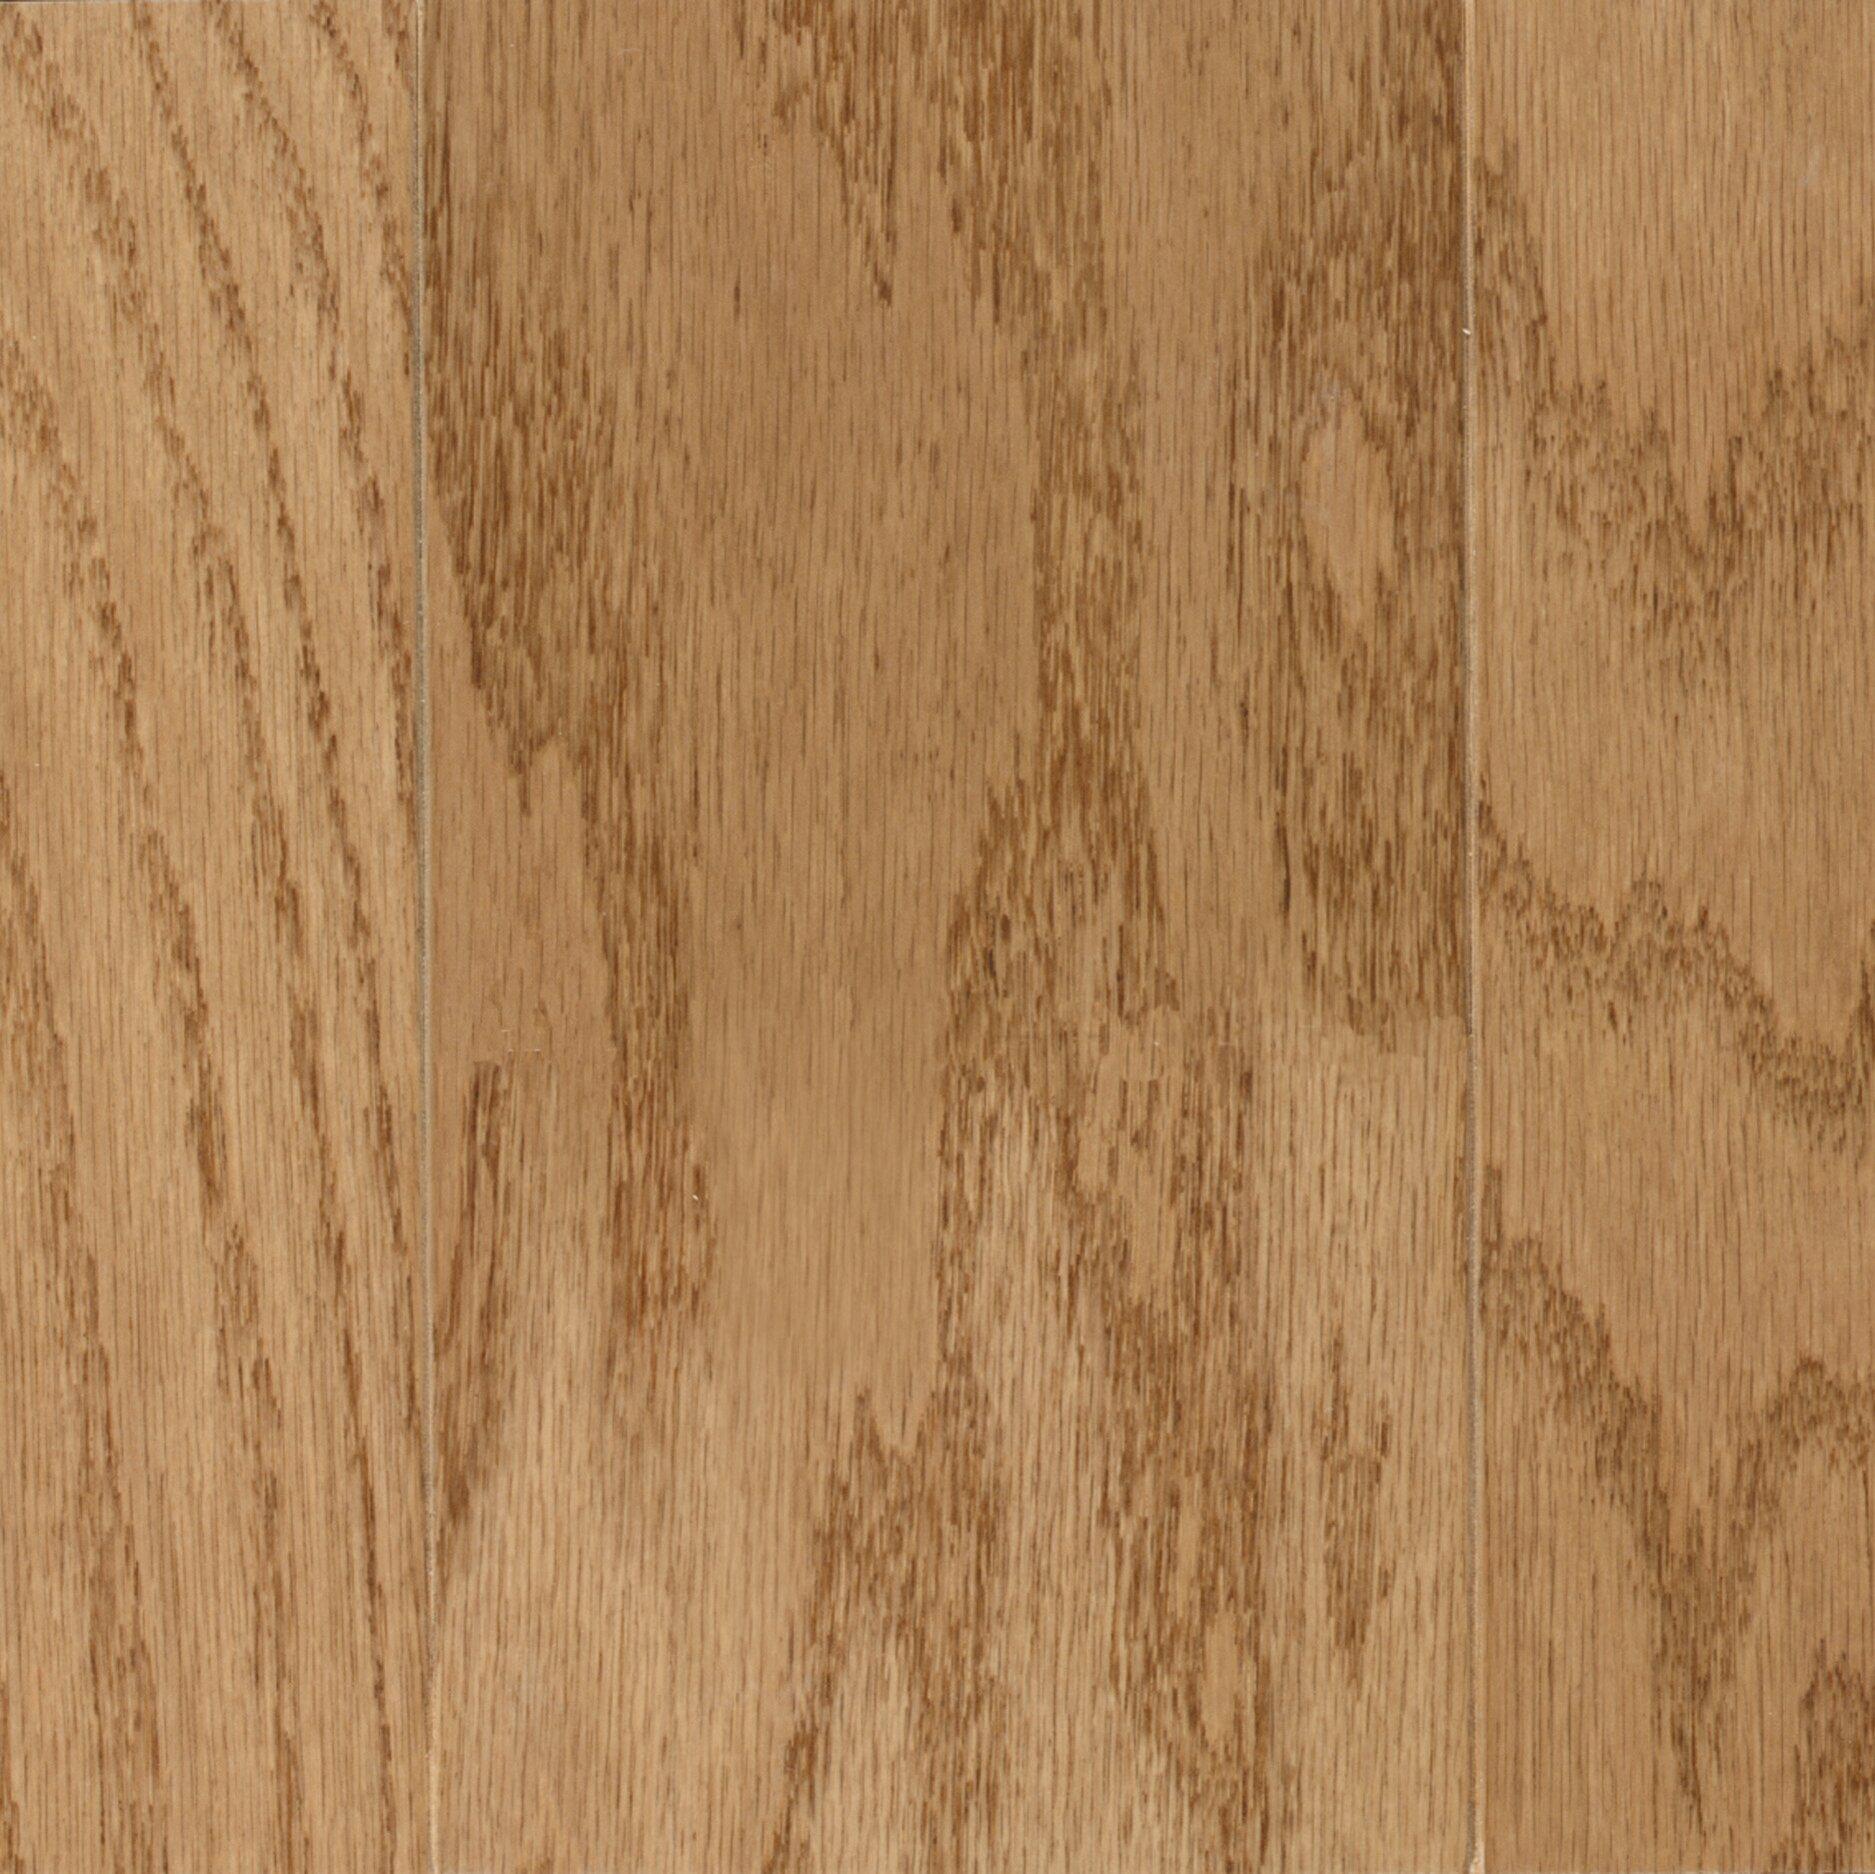 Welles Hardwood Jamestown Cove 3 Engineered Oak Hardwood Flooring